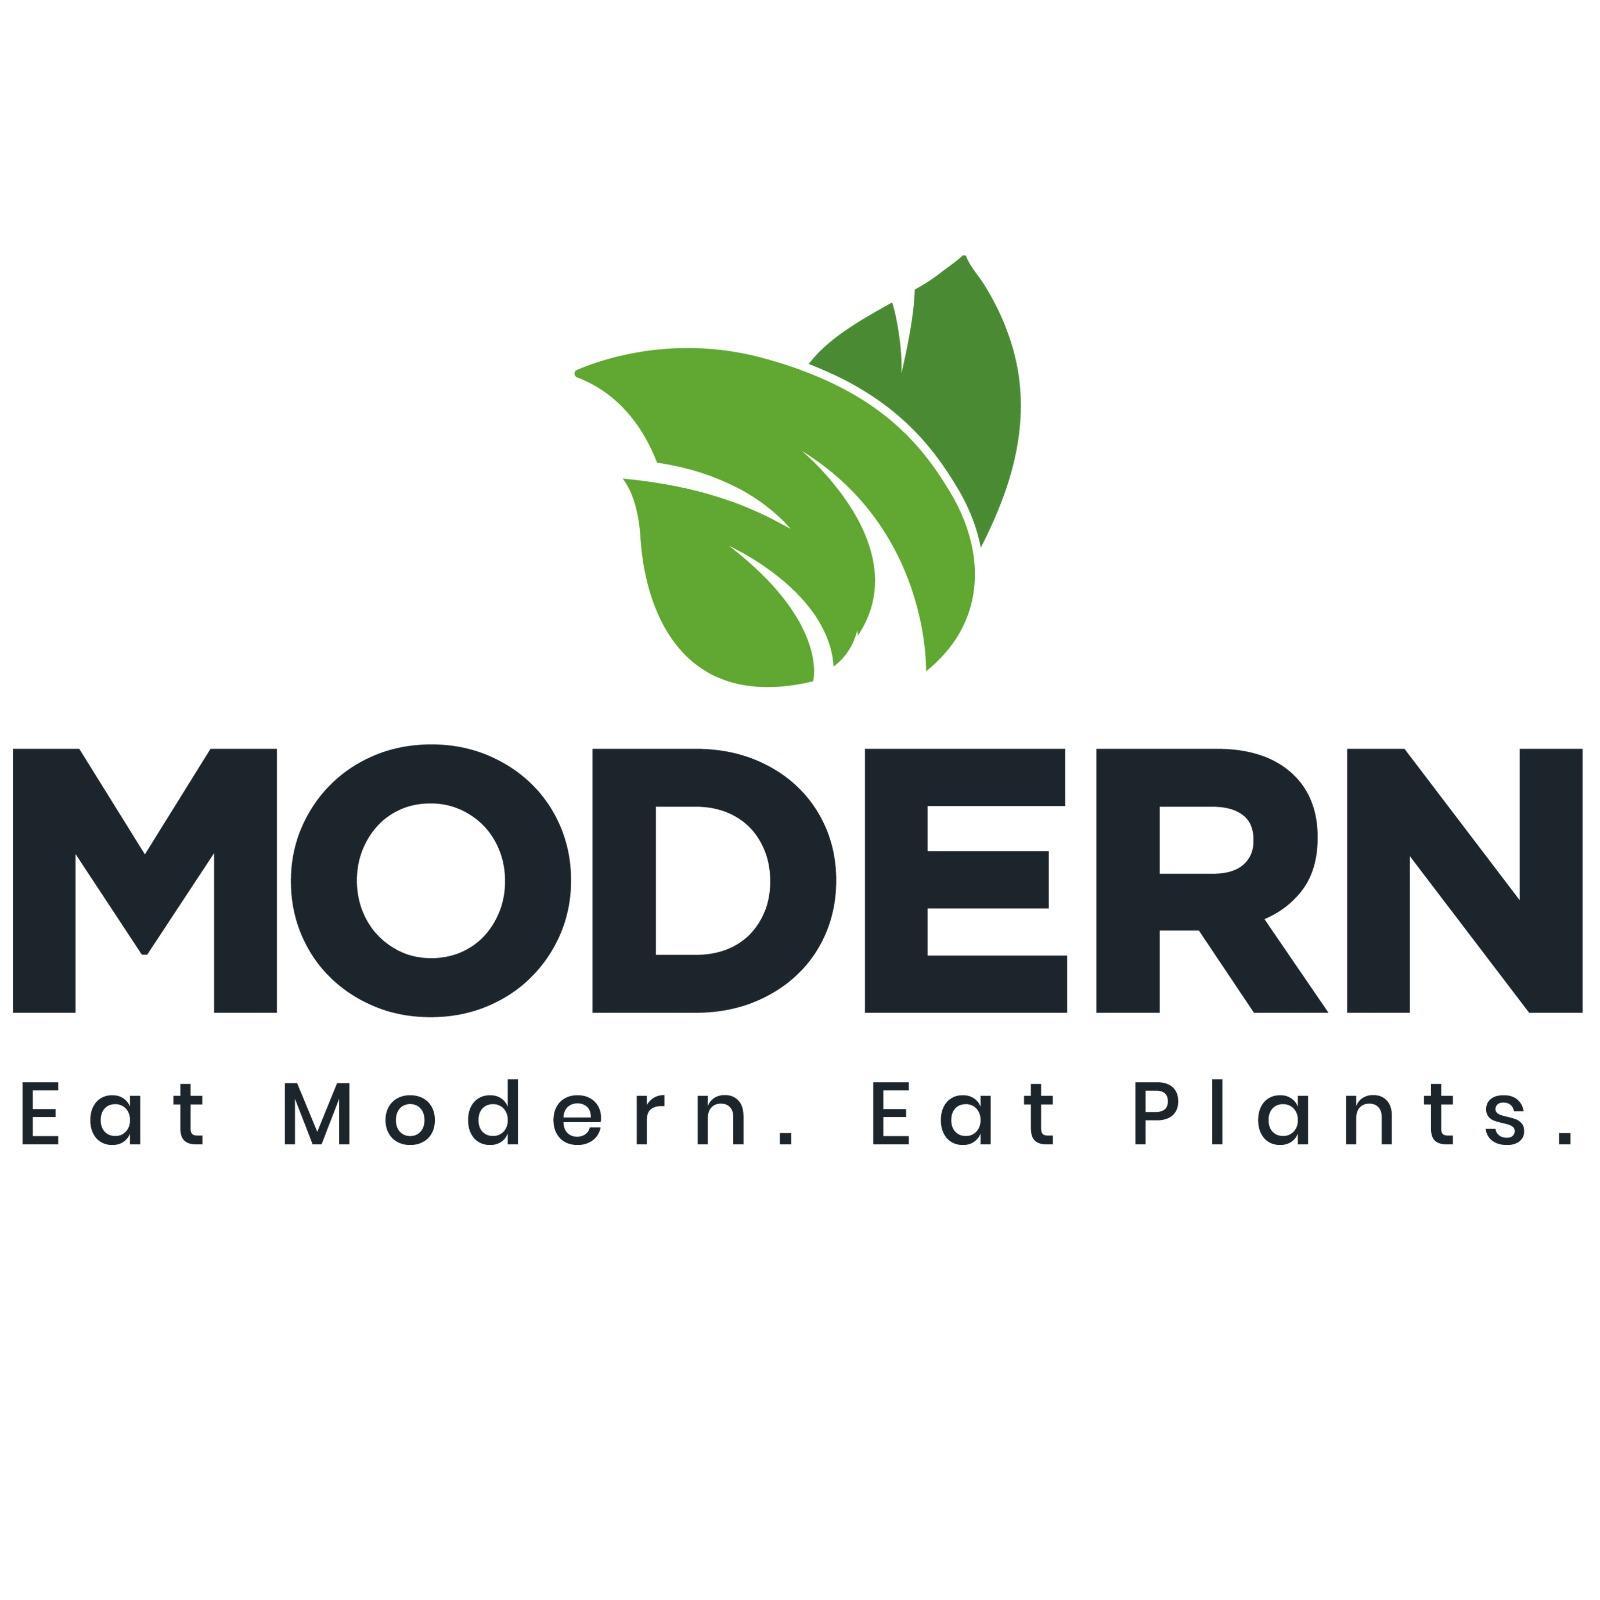 Modern Plant Based Foods Inc.